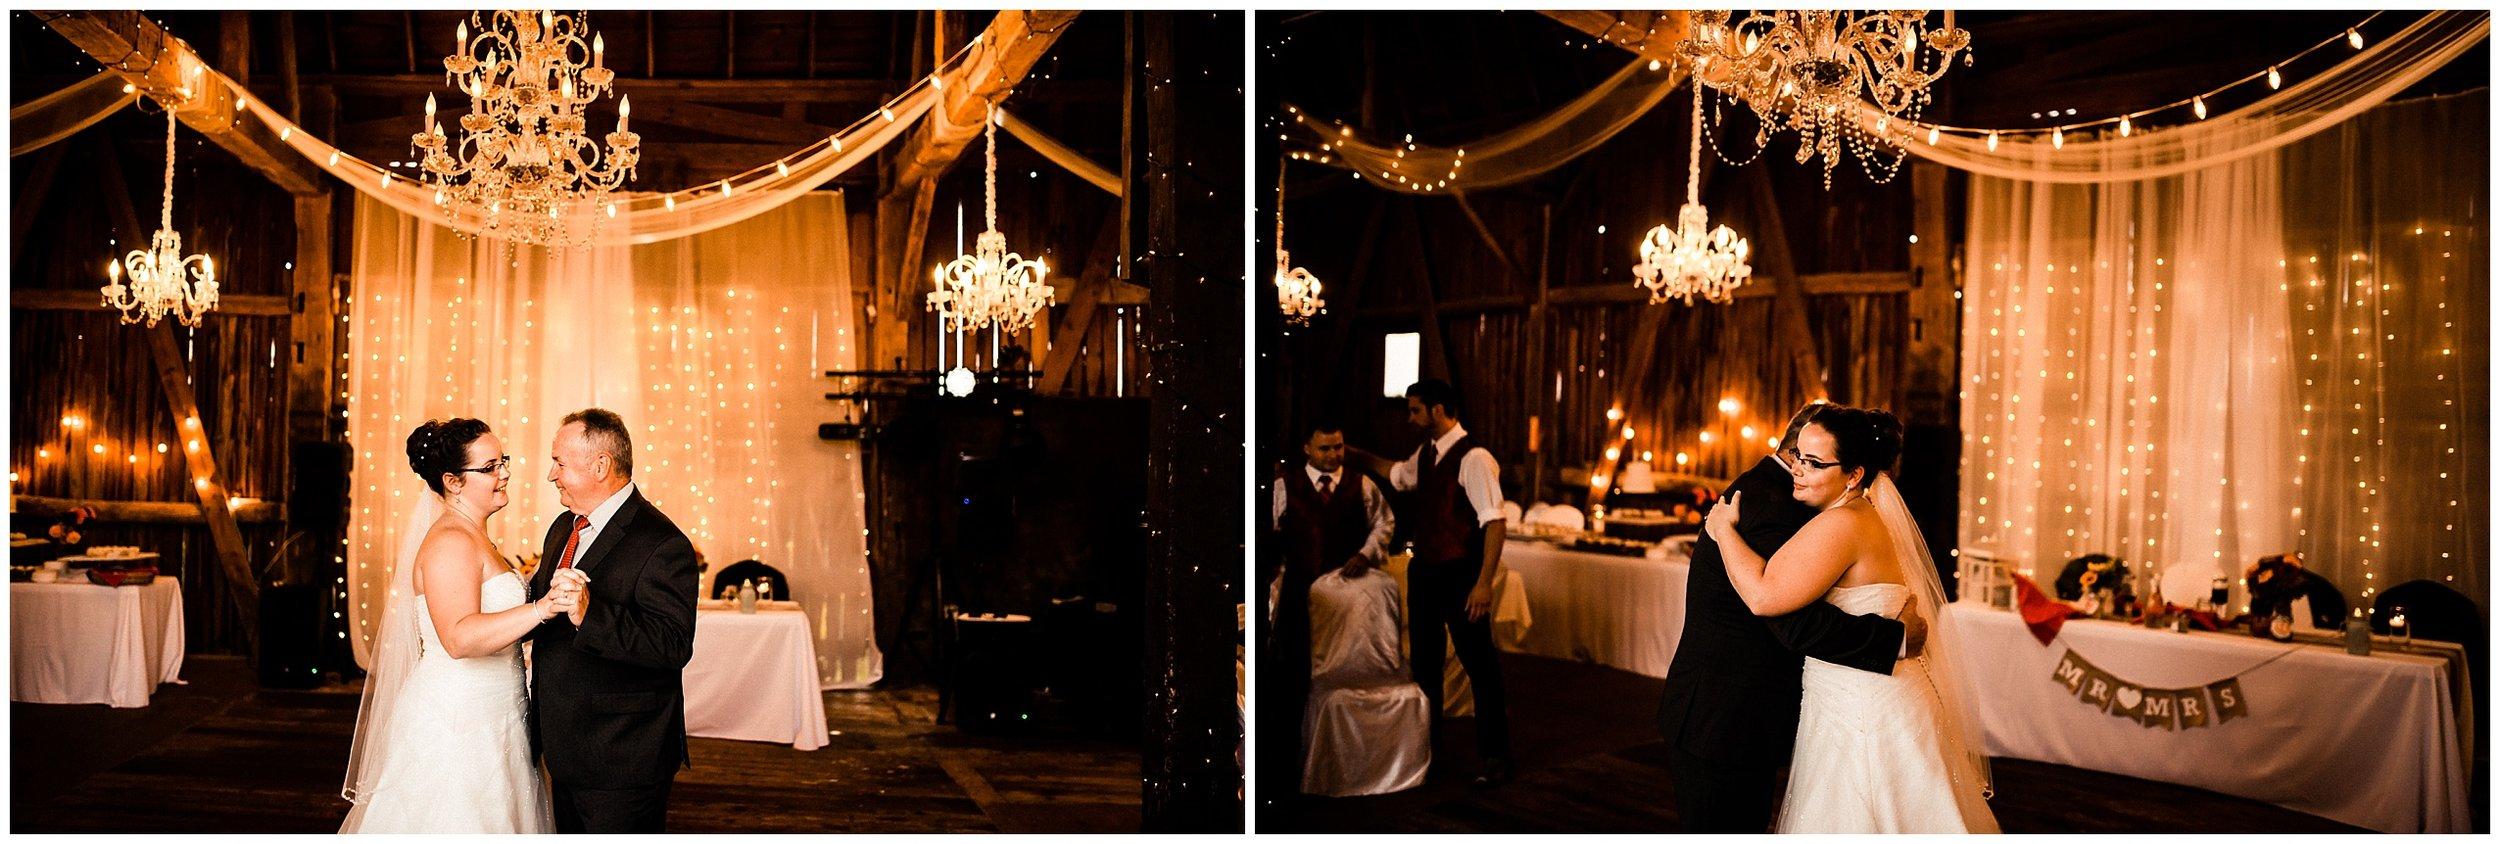 Micheal + Chelsie   Just Married #kyleepaigephotography_1617.jpg